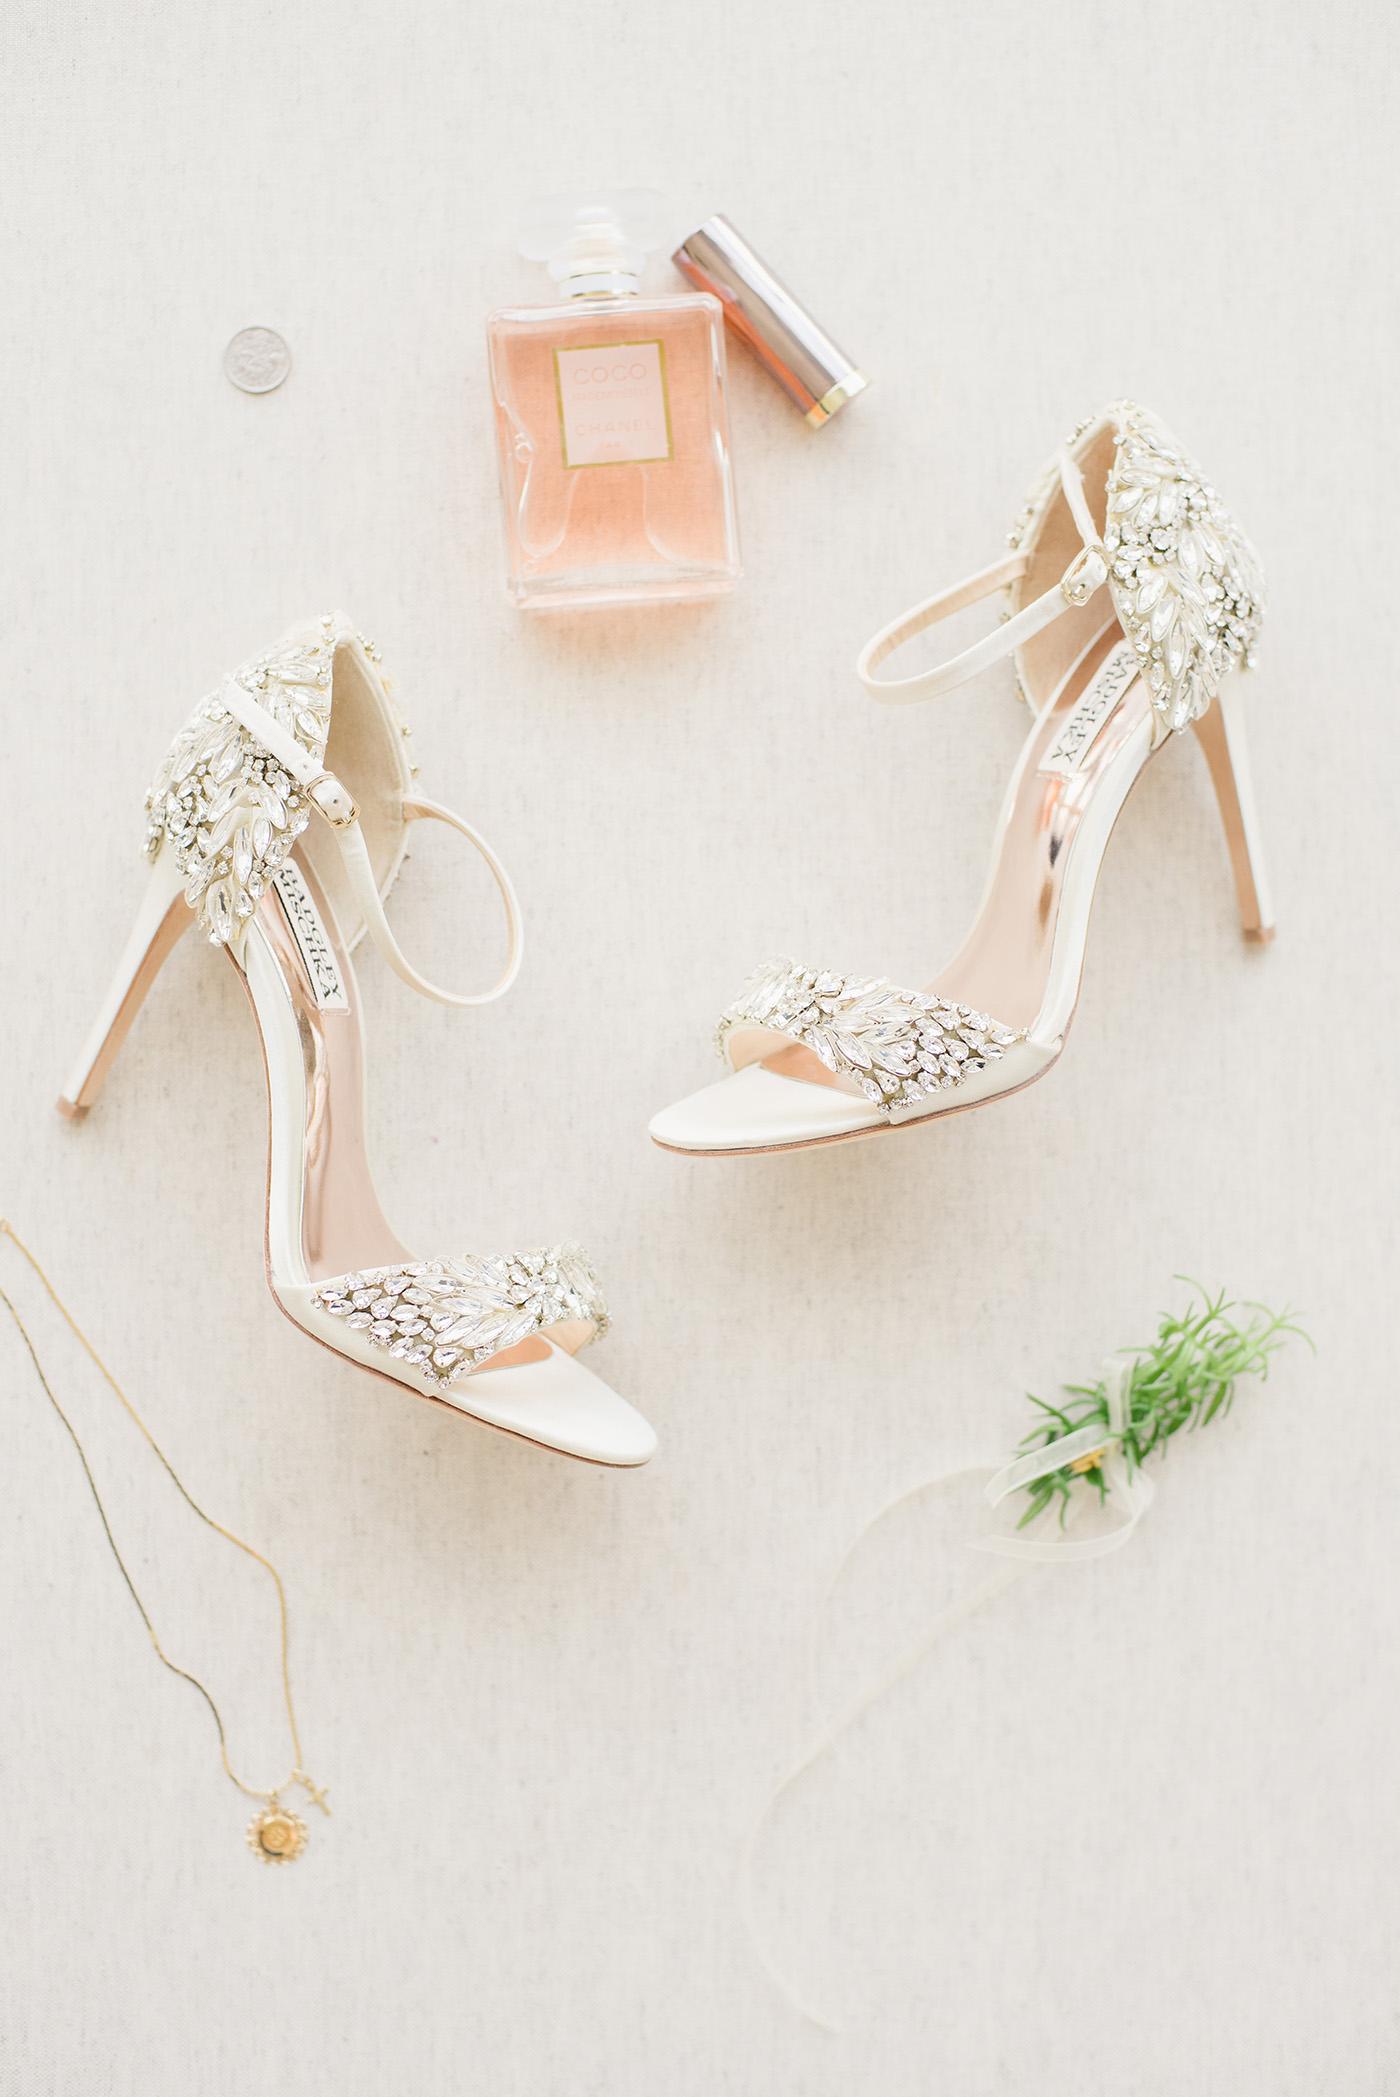 Dallas Wedding Planner - Winter Wedding at The Room on Main - Allday Events - 3.jpg